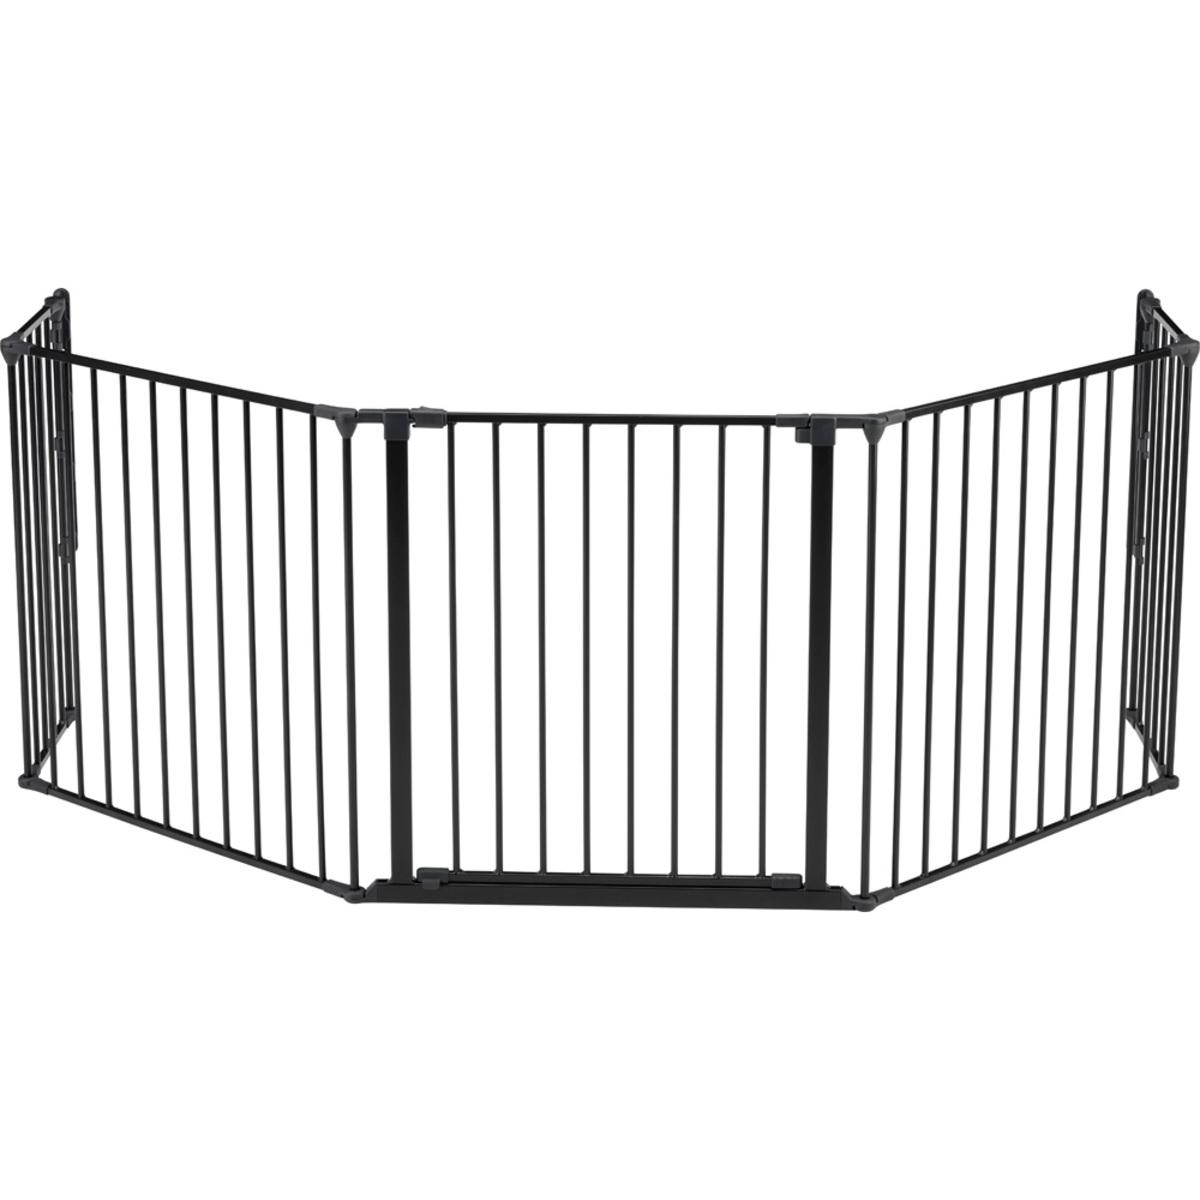 Barrière de sécurité Barrière de Sécurité Configure Taille XL - Noir Barrière de Sécurité Configure Taille XL - Noir